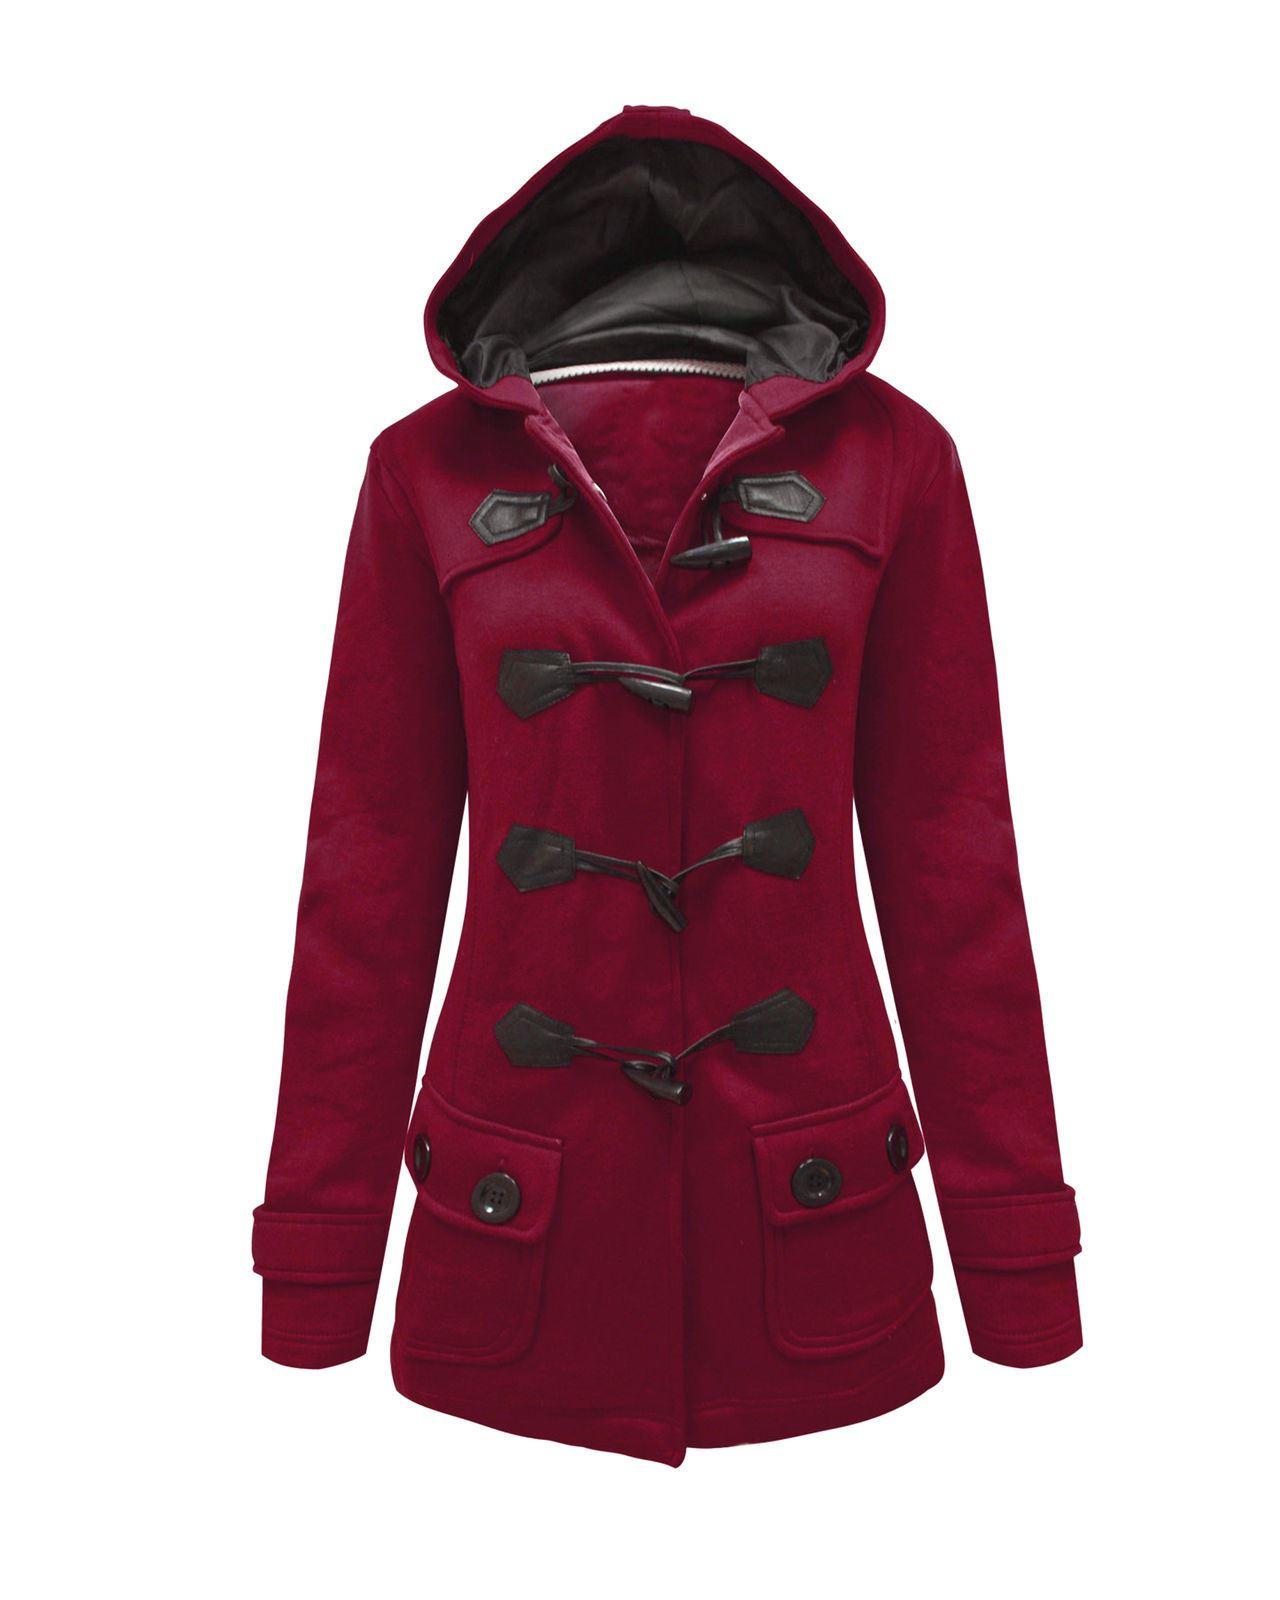 Flannel jackets for women